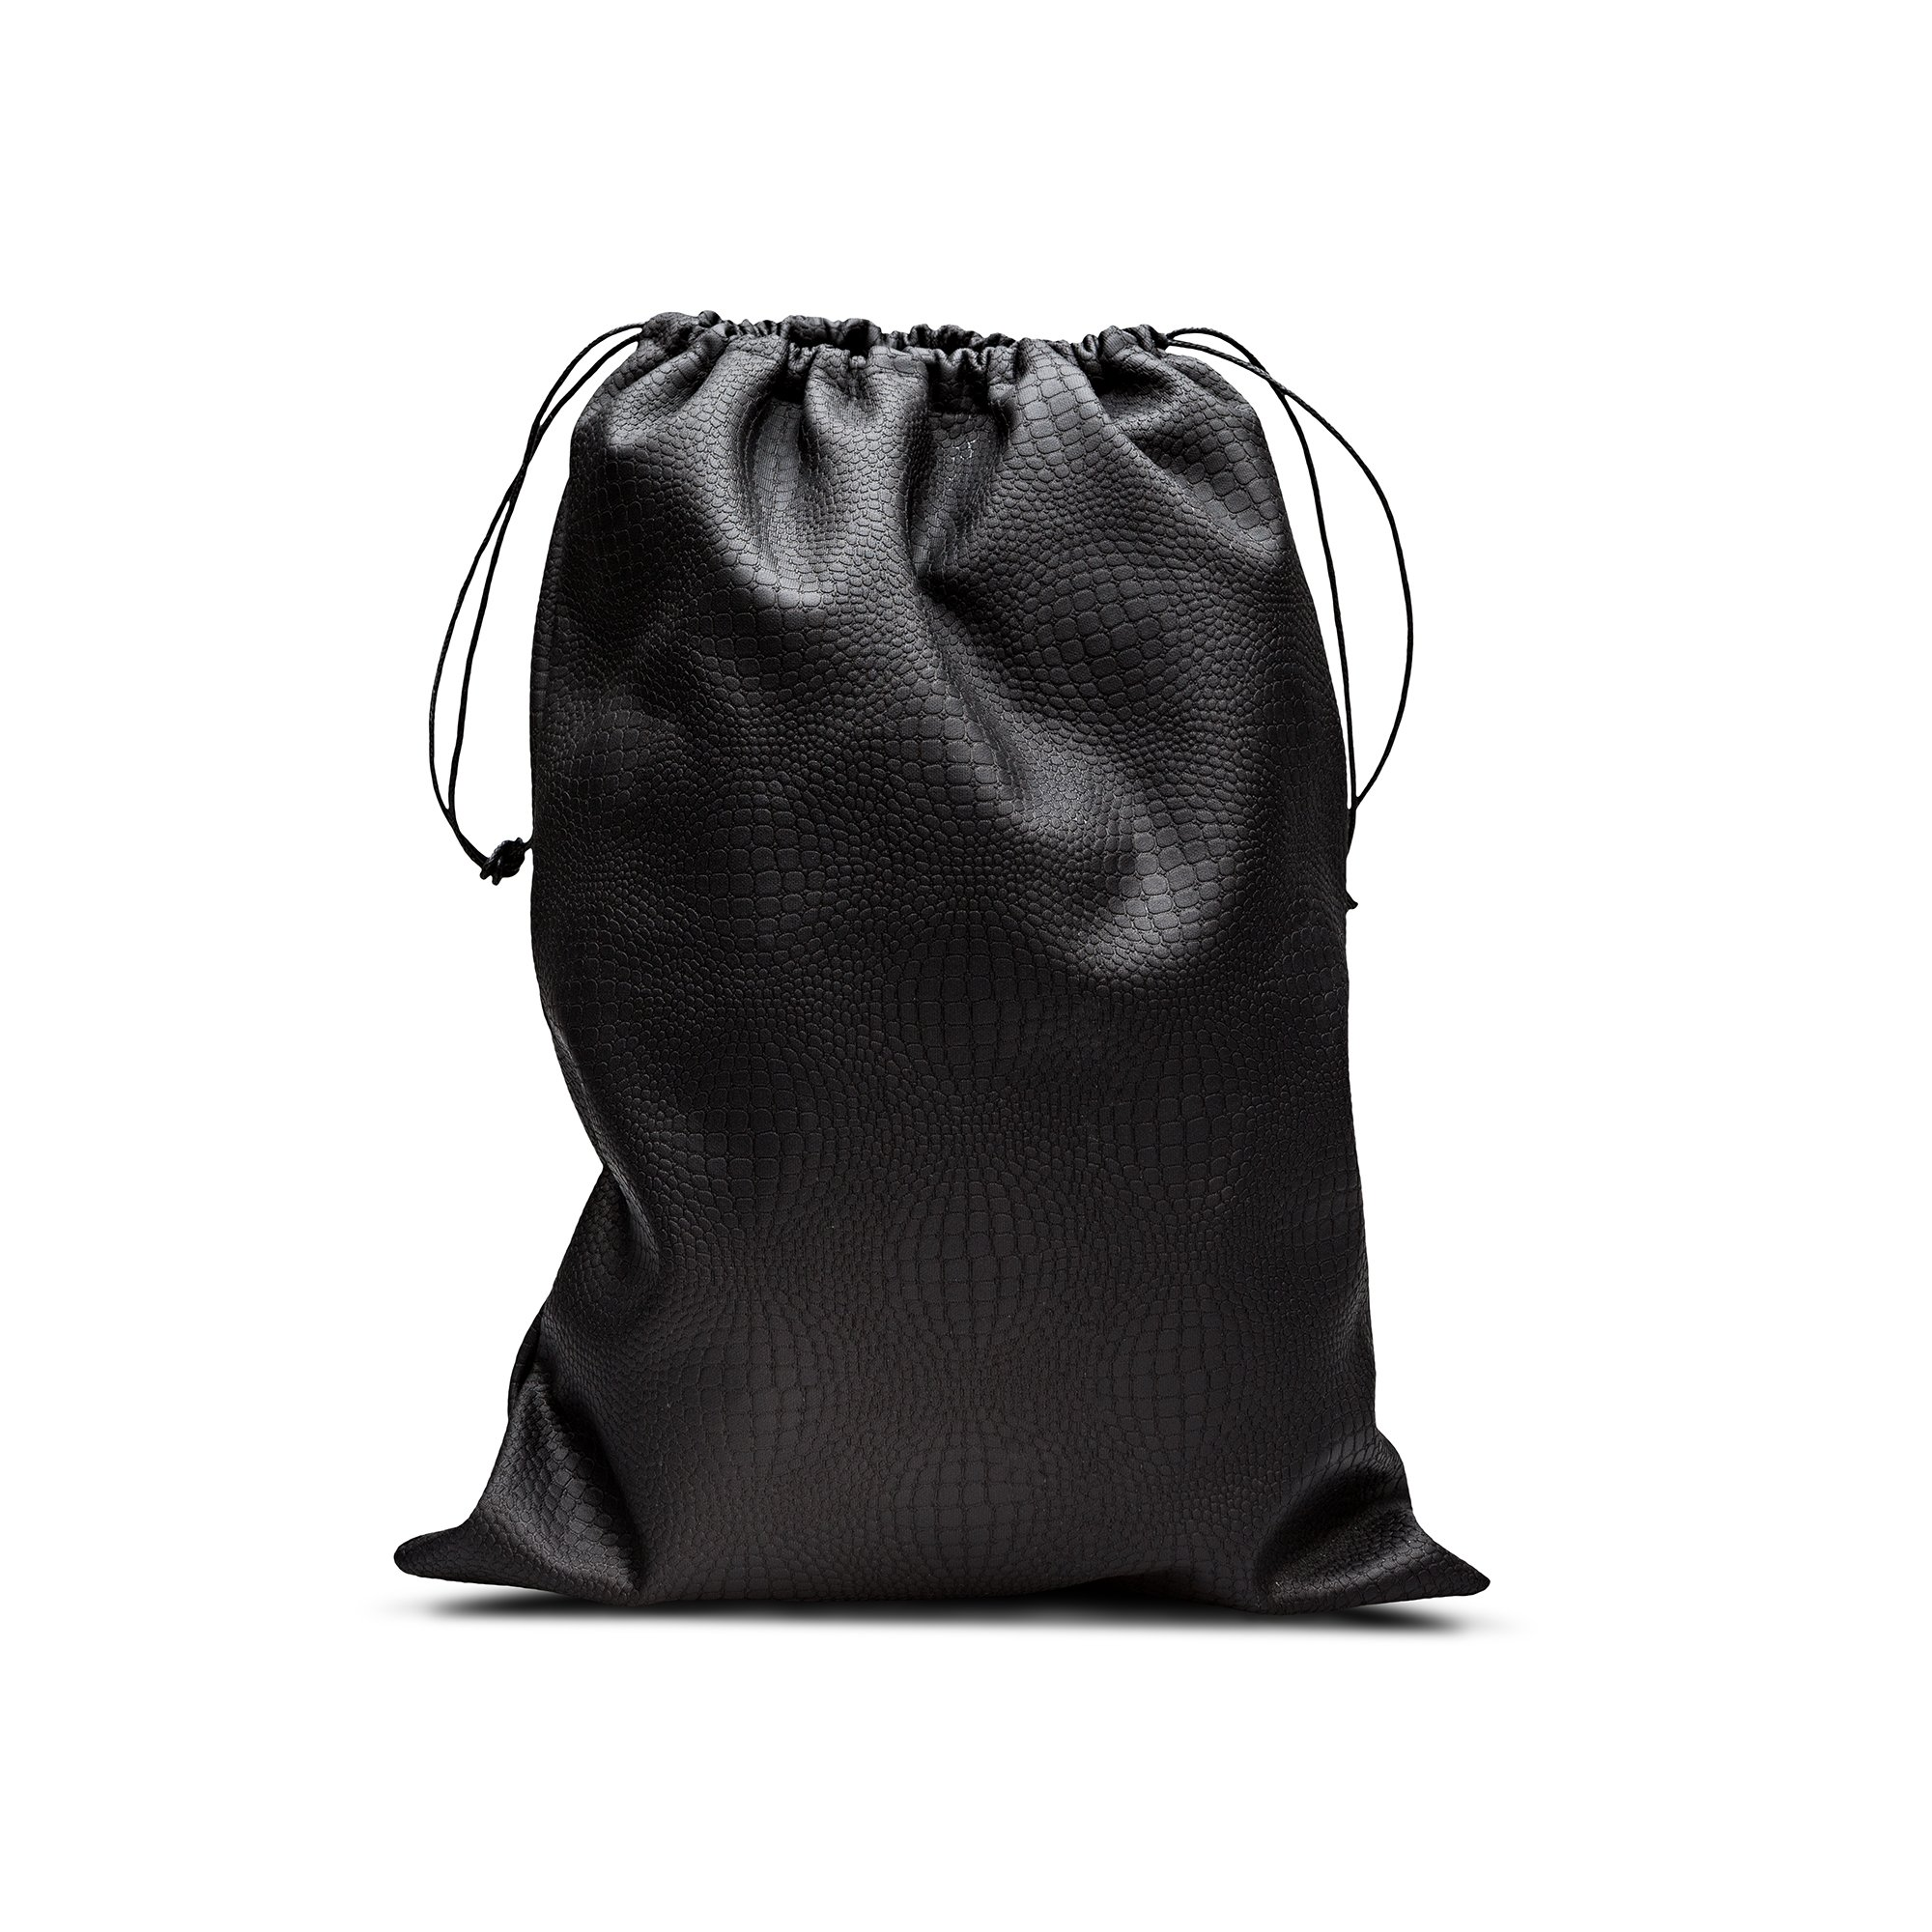 Reptile fabric shoebags with drawstrings